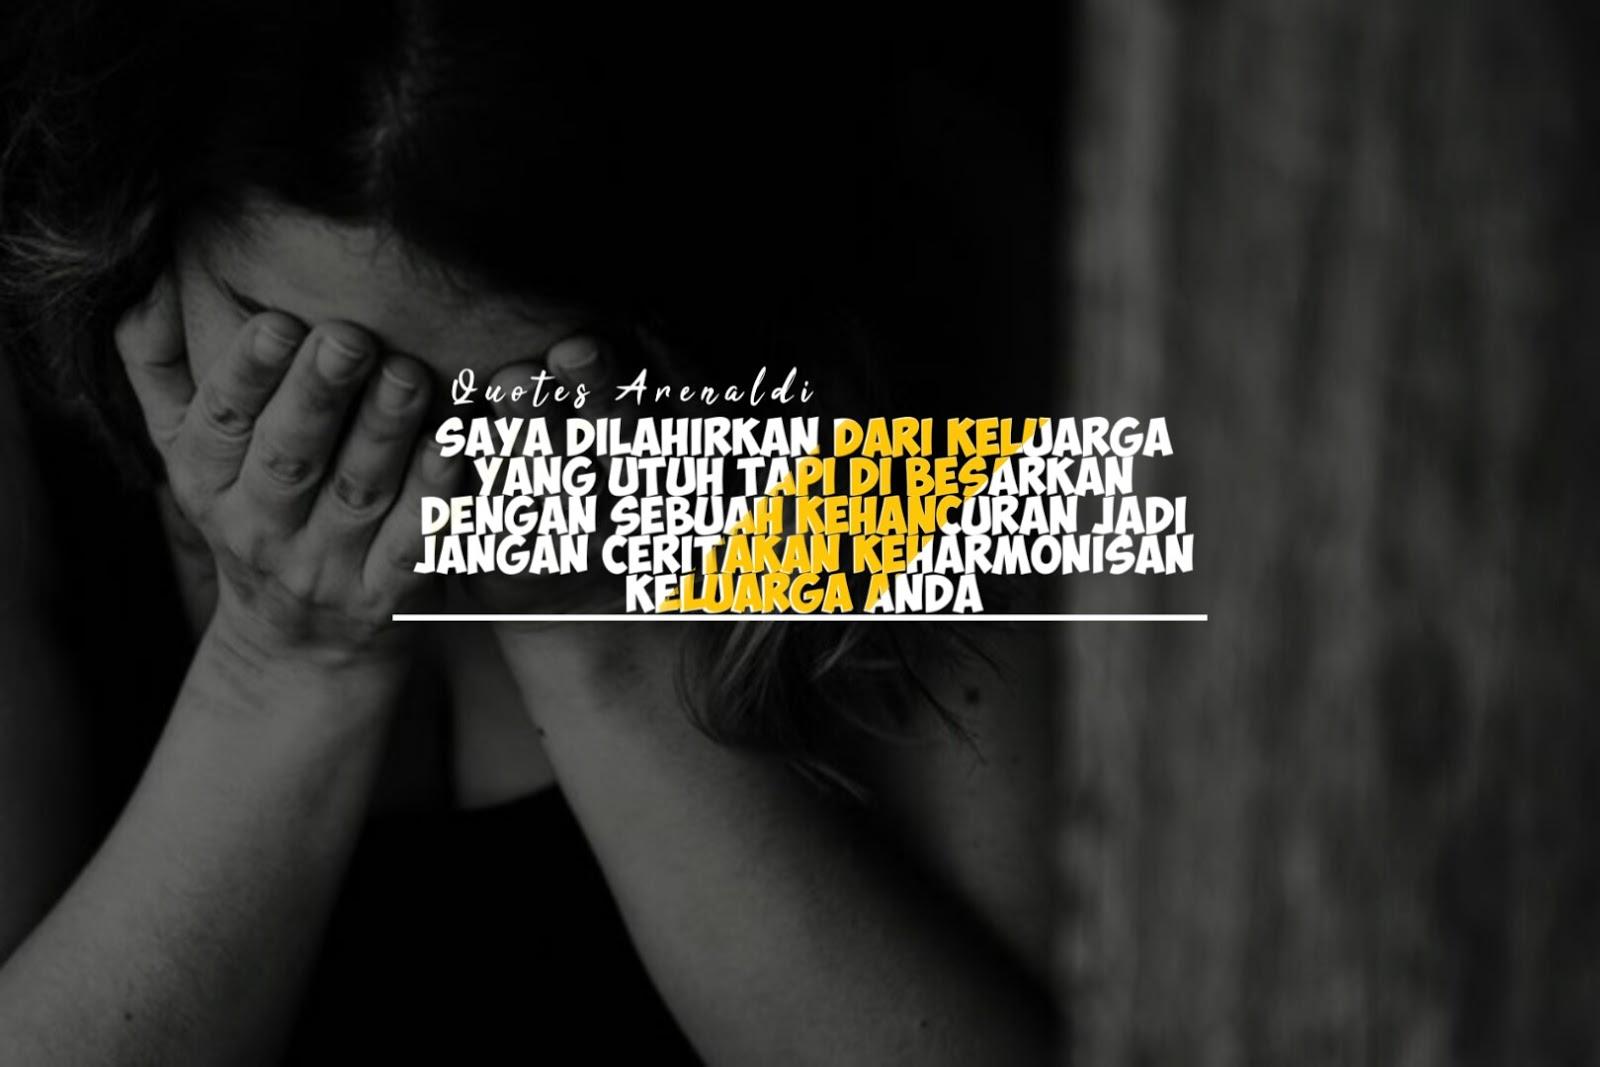 Kumpulan Gambar Quotes Tentang Anak Broken Home